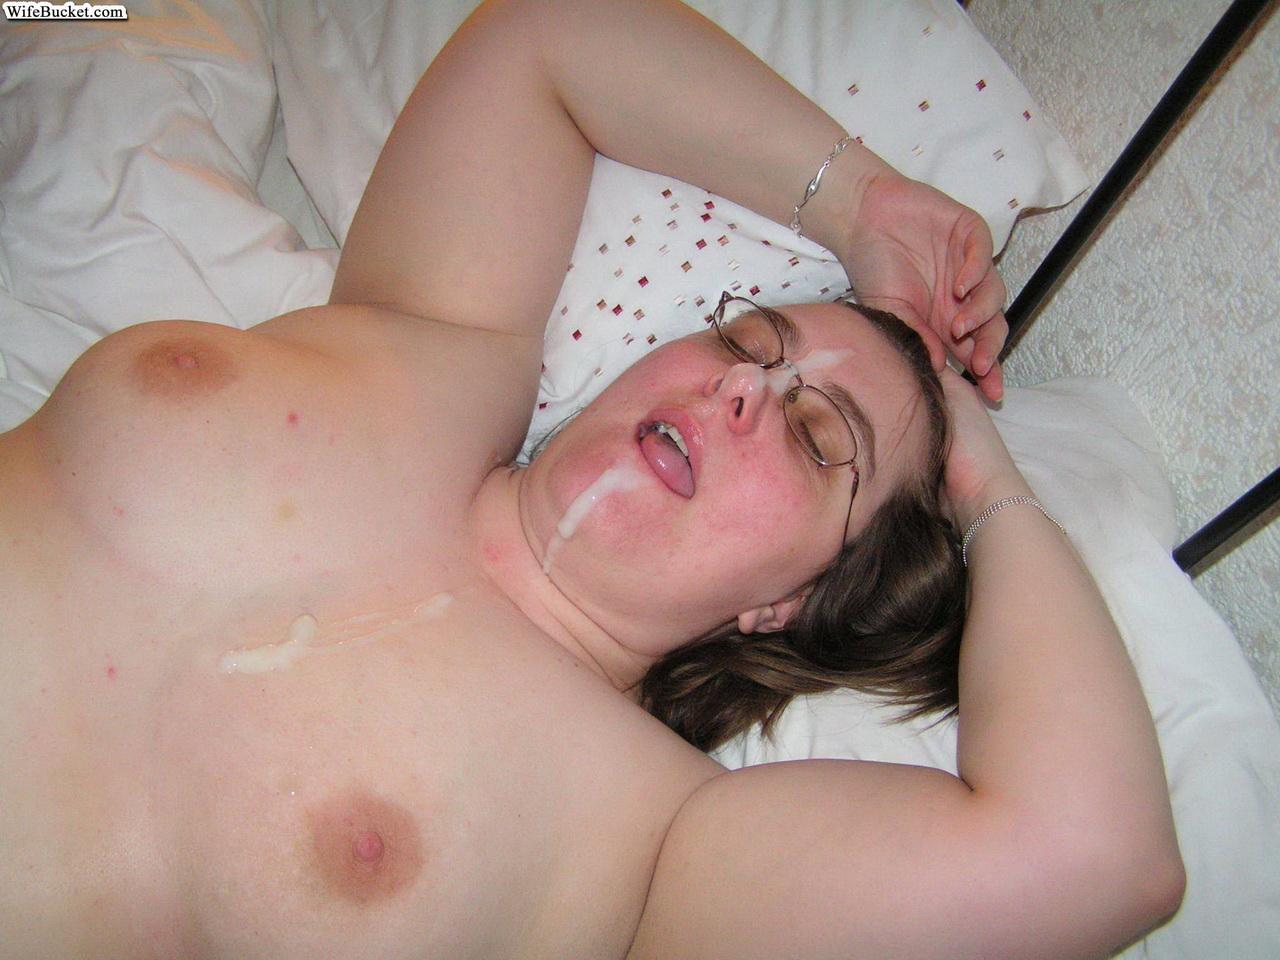 Nude perfect butt female